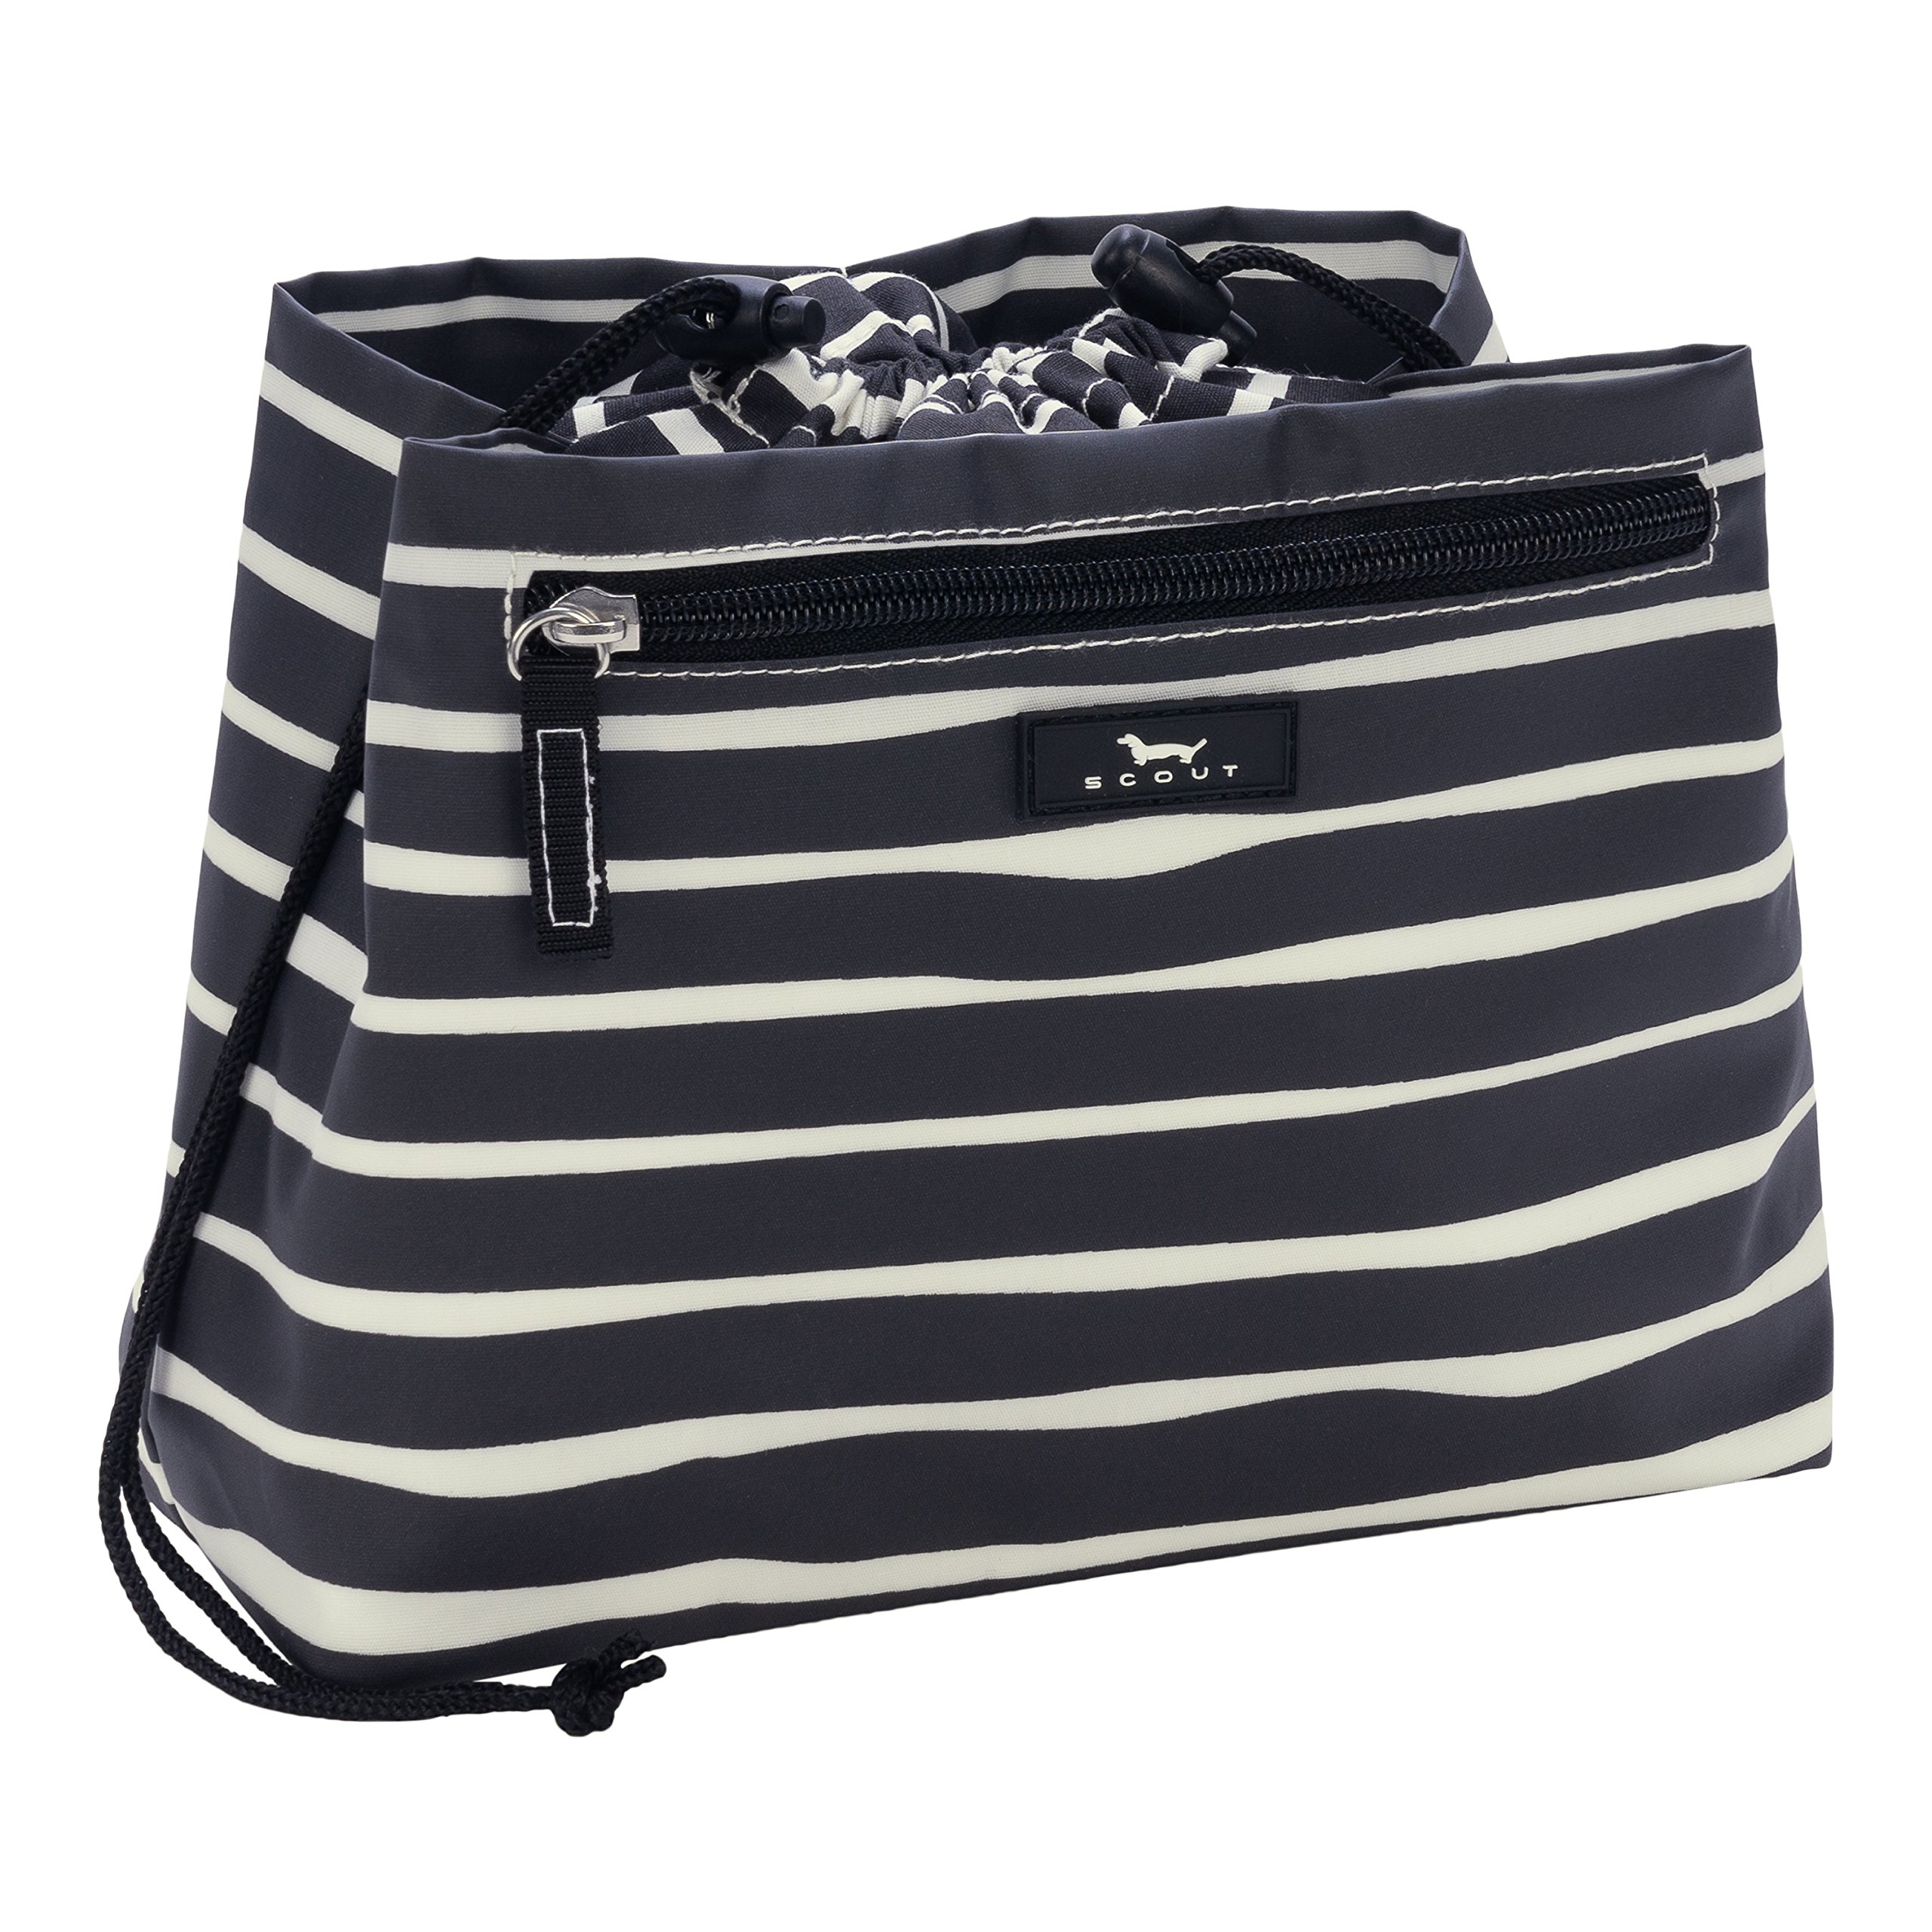 SCOUT Glam Squad Makeup & Cosmetic Bag, Cinch-Top Closure, 4 Open Pockets, Water Resistant, Ren Noir